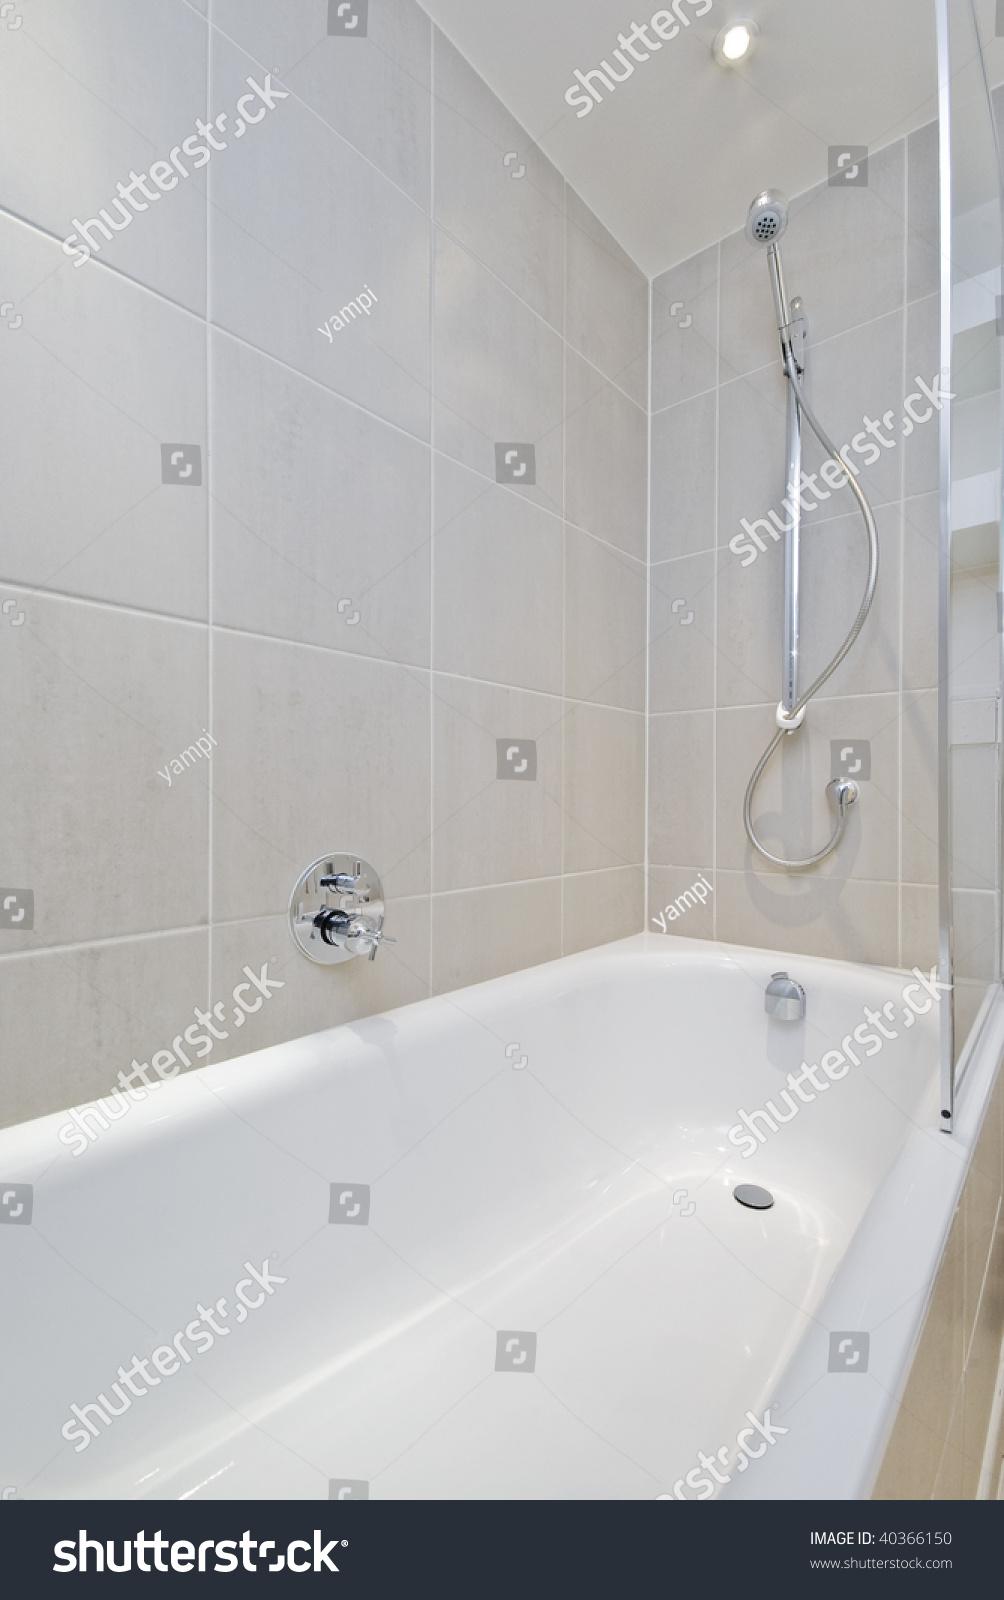 https www shutterstock com image photo modern ceramic bath tub shower attachment 40366150